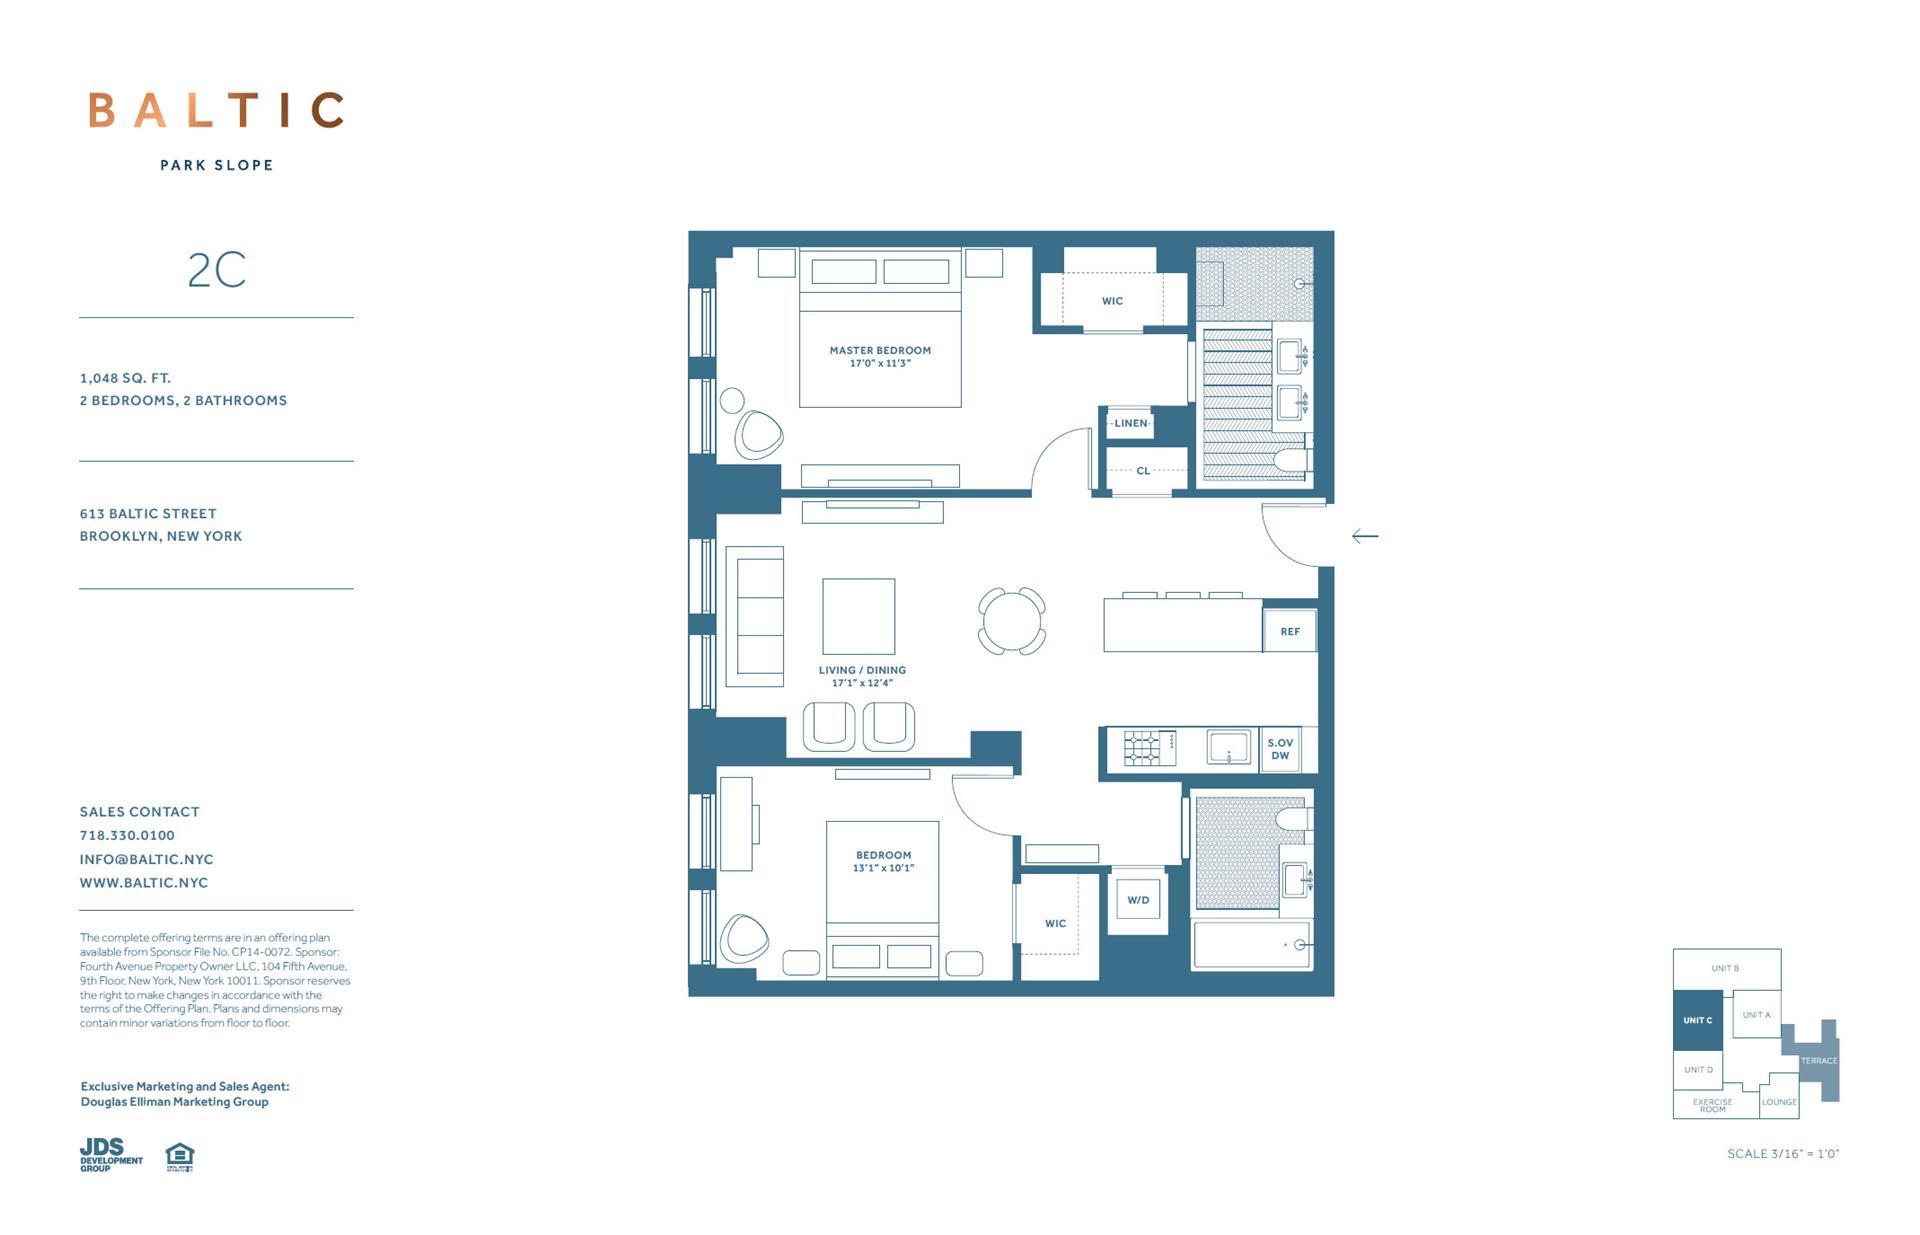 Floor plan of 613 Baltic St, 2C - Park Slope, New York